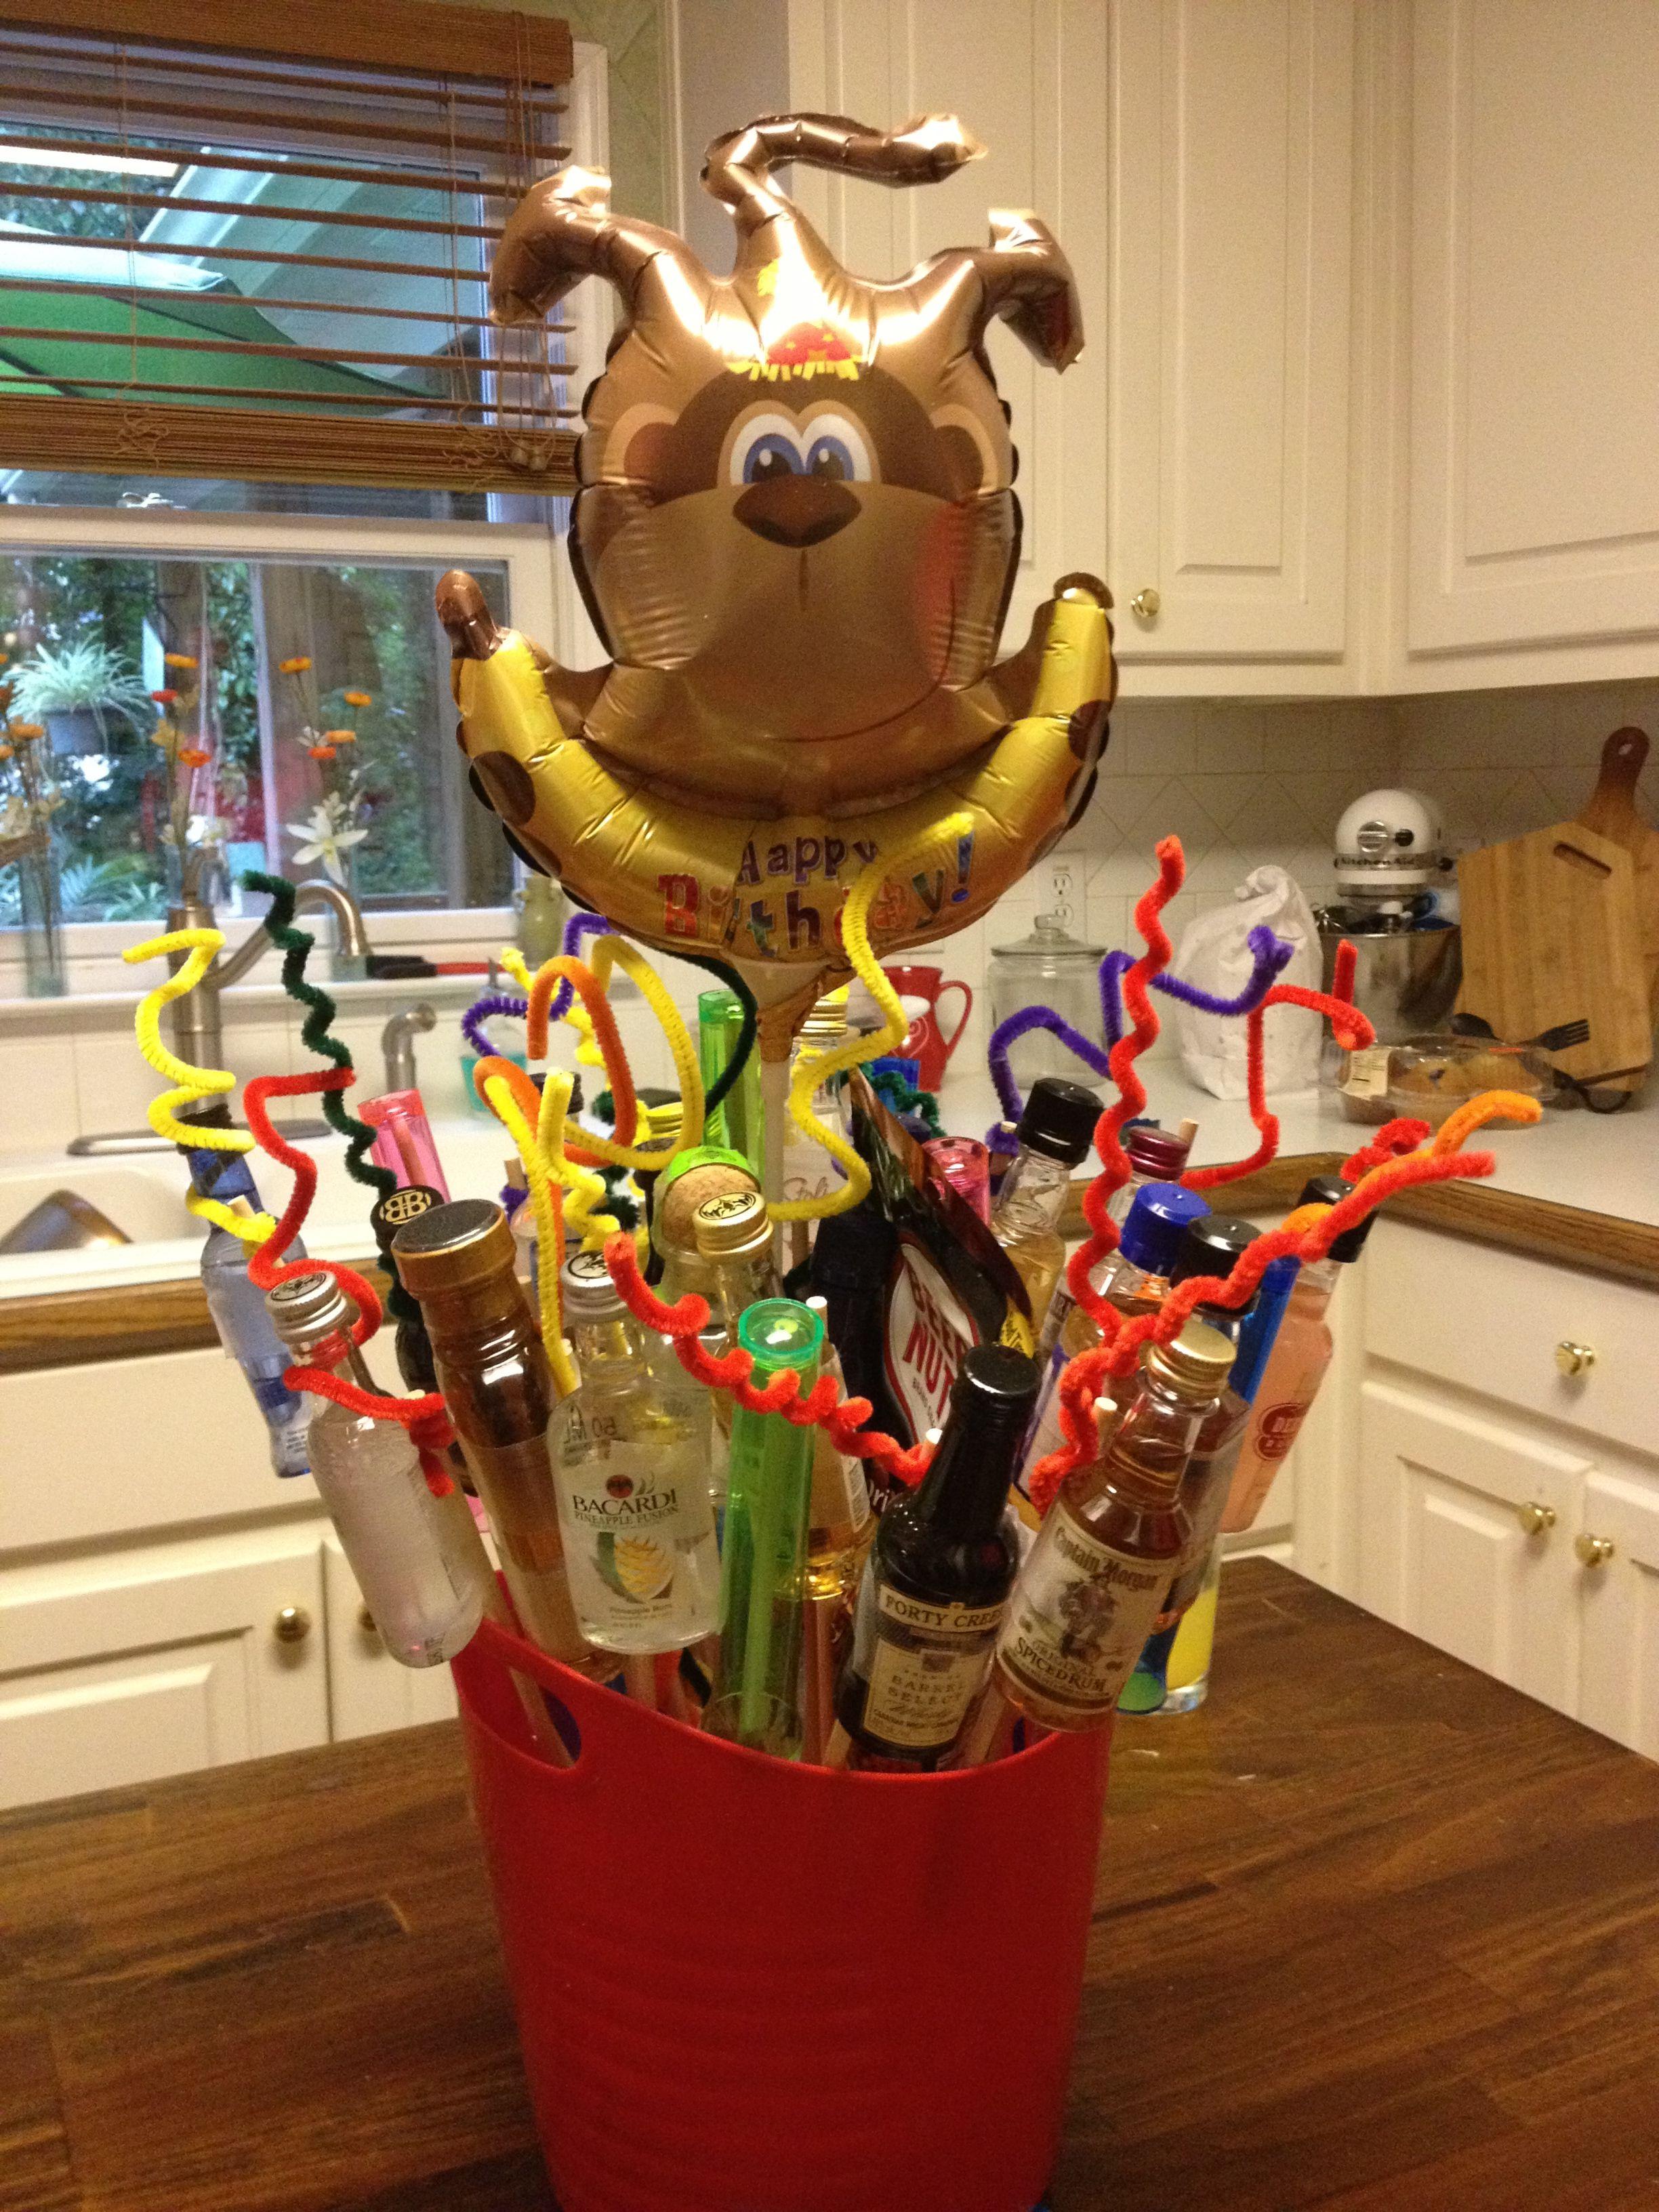 21st birthday bucket with 21 shots plastic shot glasses